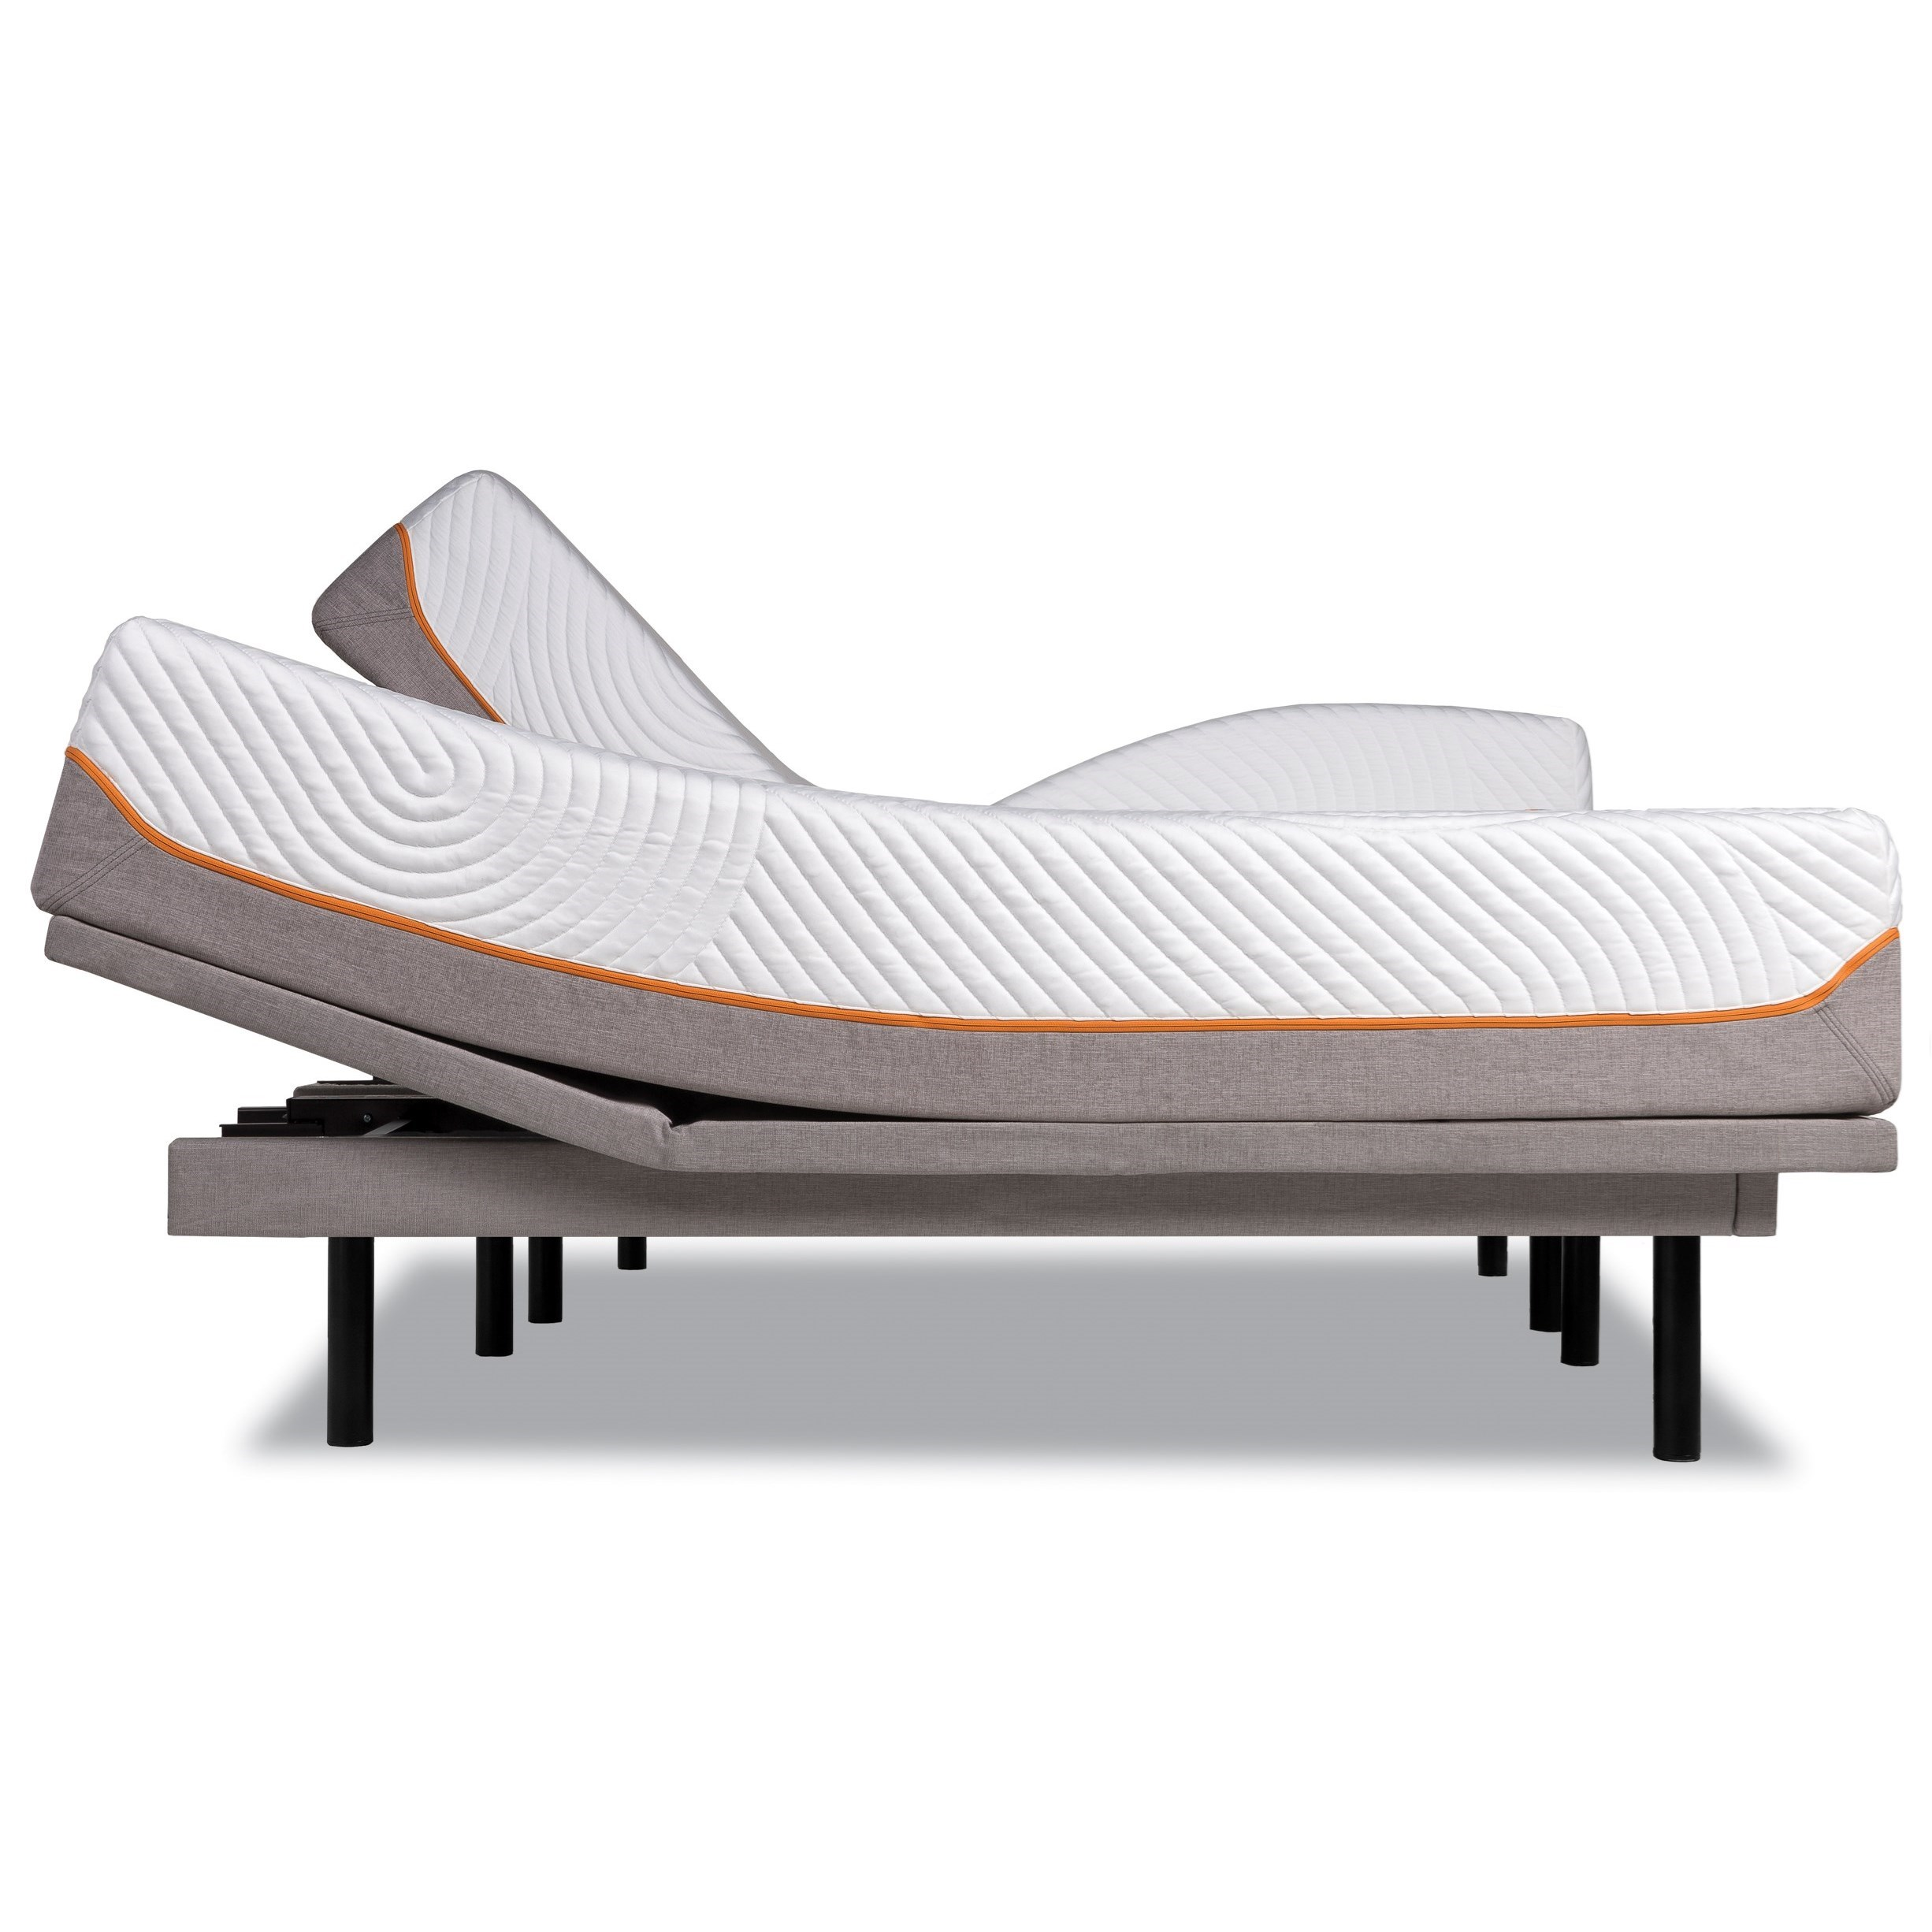 Tempur-Pedic® TEMPUR-Contour Rhapsody Luxe King Medium Firm Mattress, Adj Set - Item Number: 10258170+2x25289220